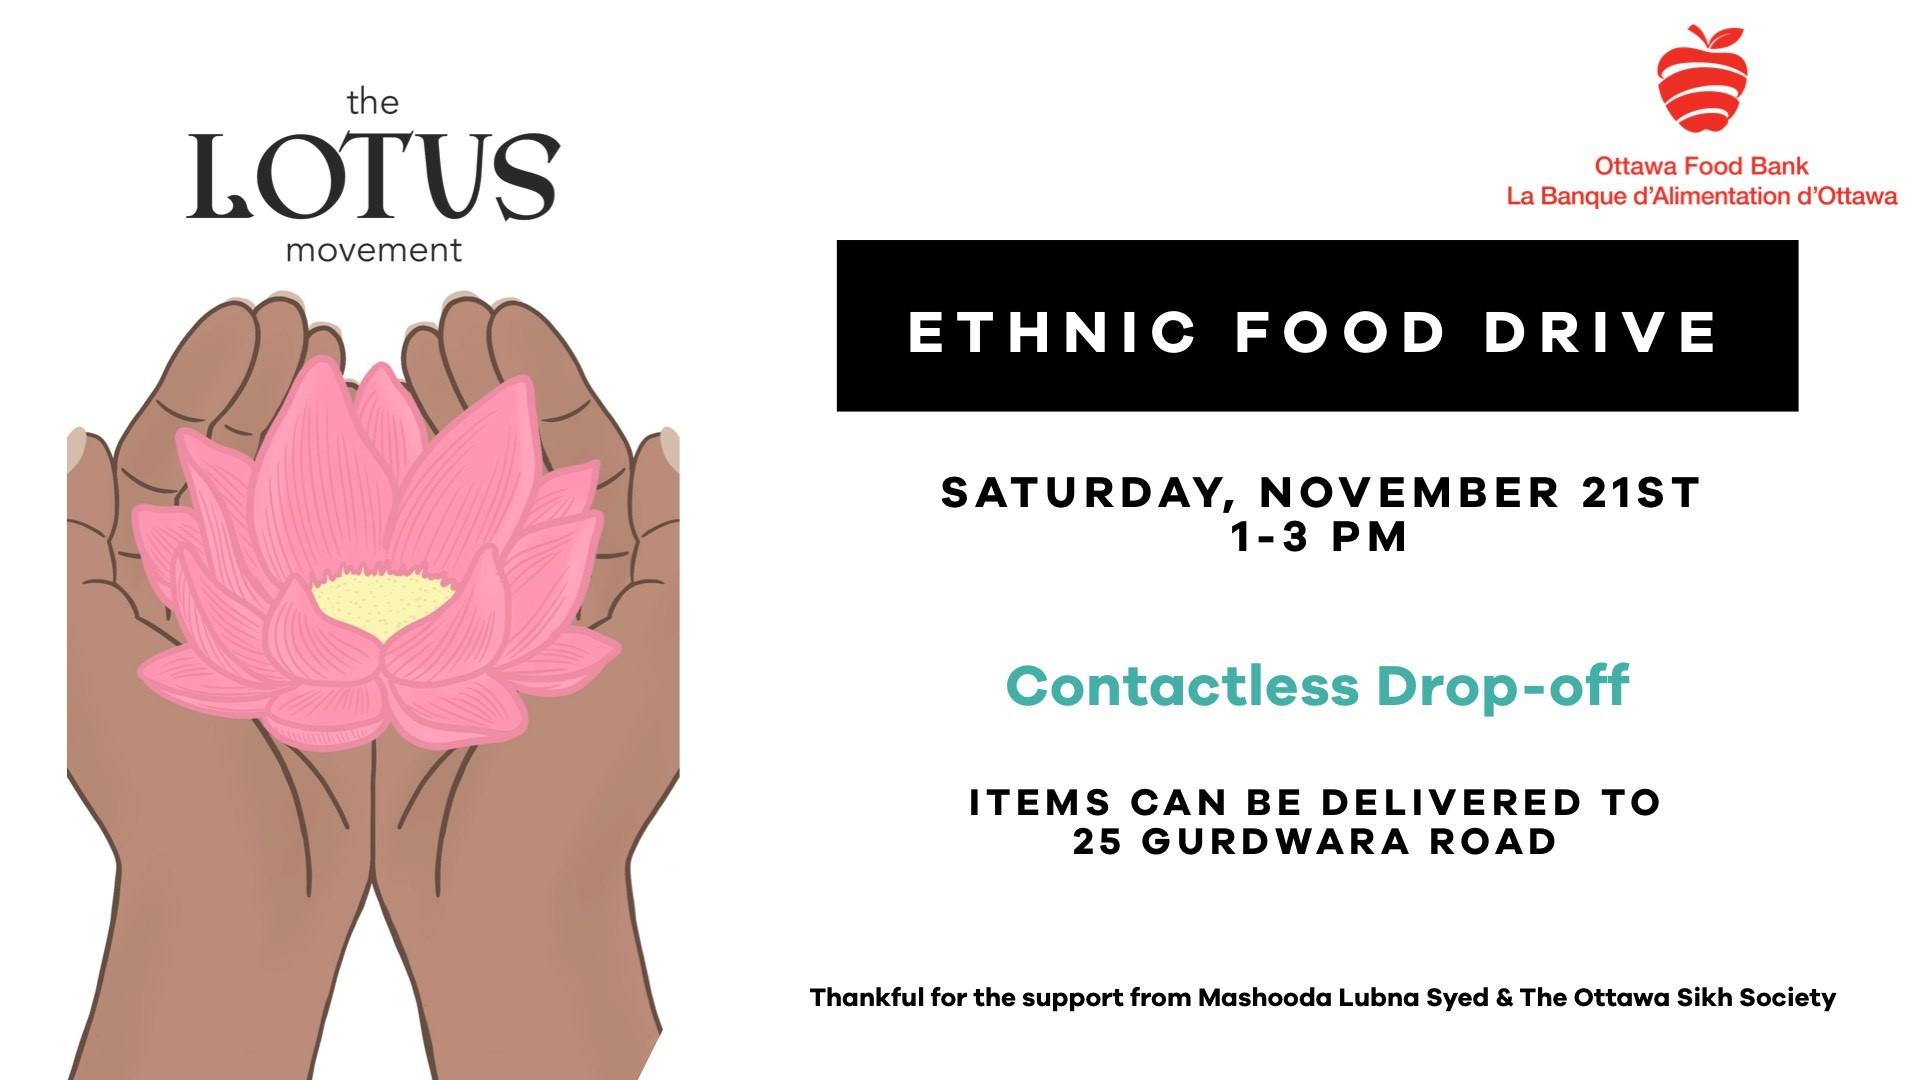 The Lotus Movement ethnic food drive